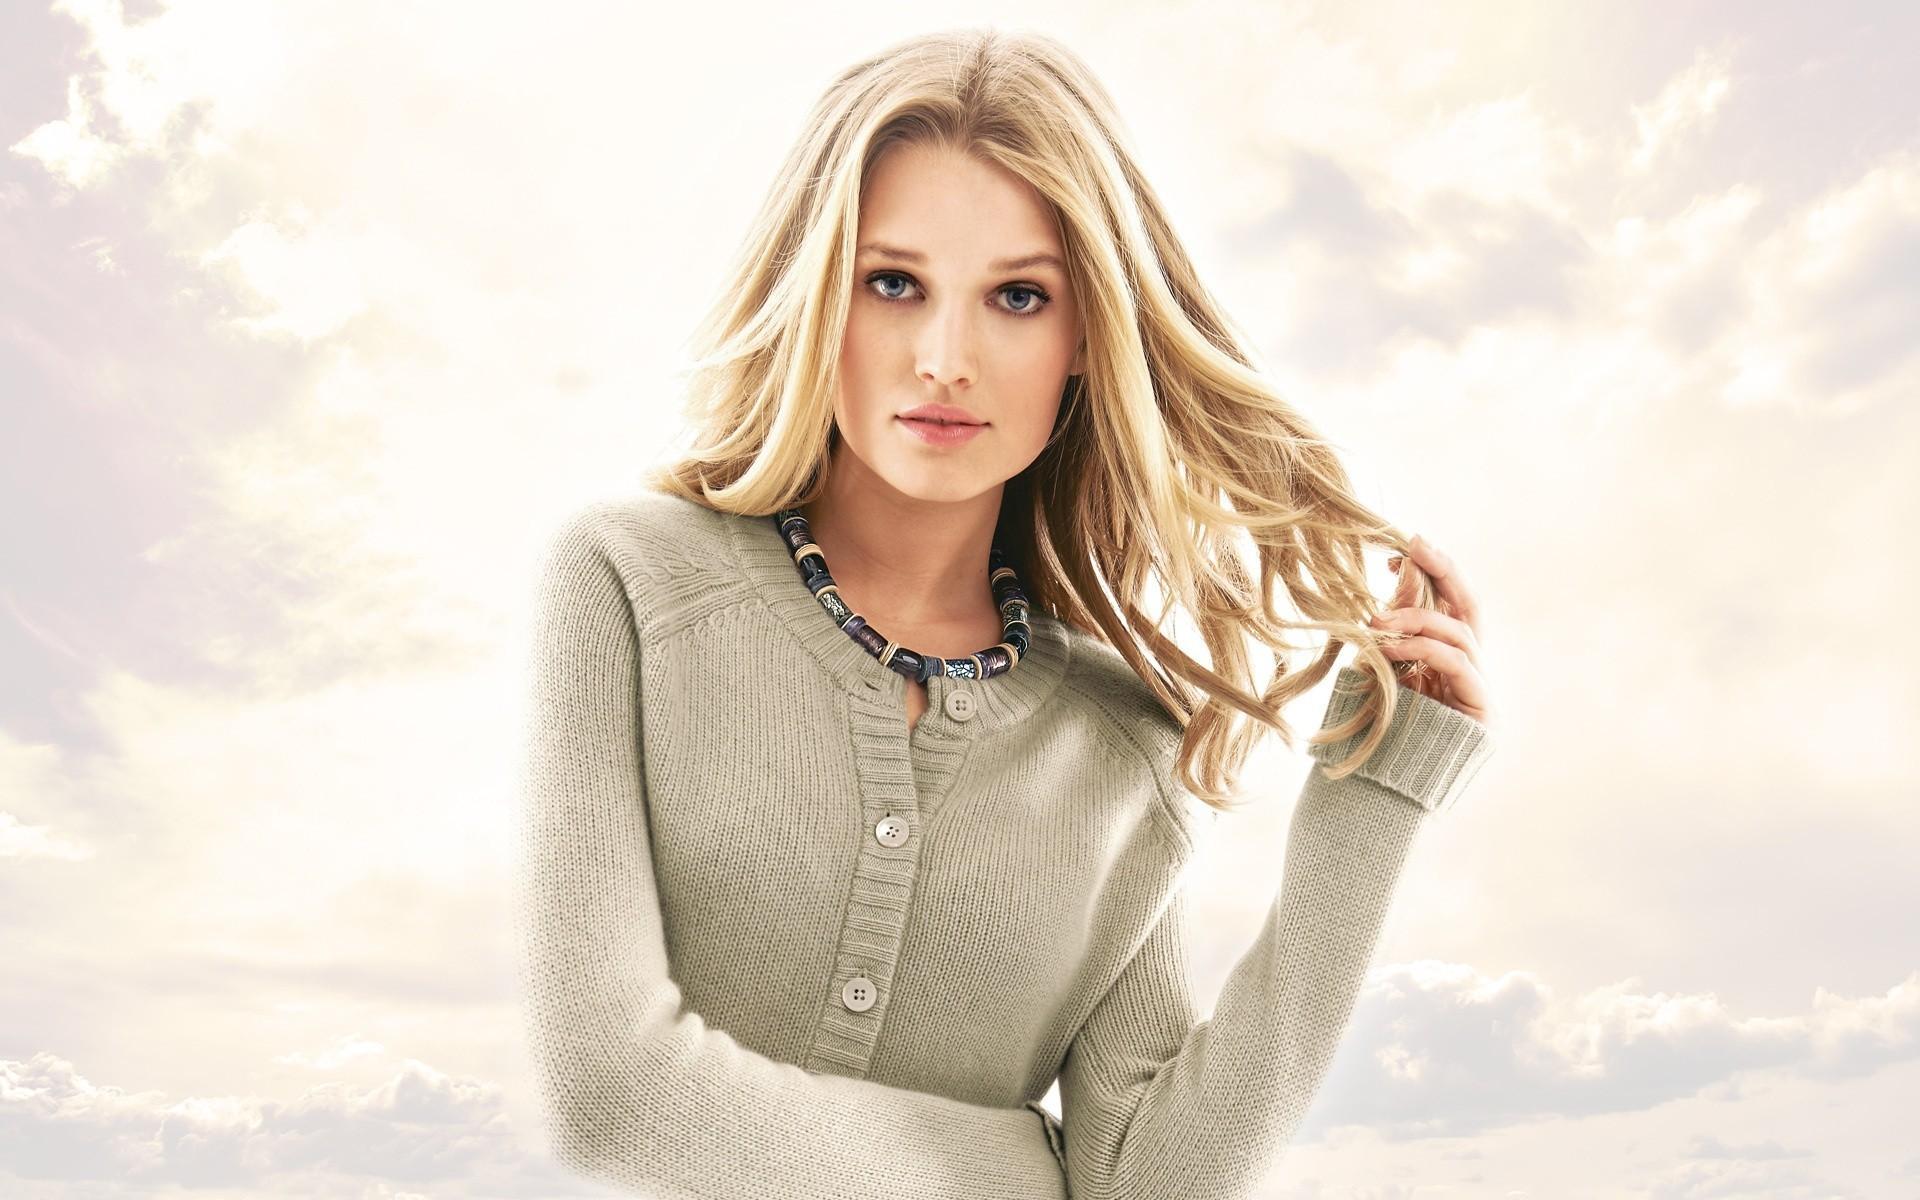 Wallpaper : women, model, blonde, long hair, blue eyes, fashion ...